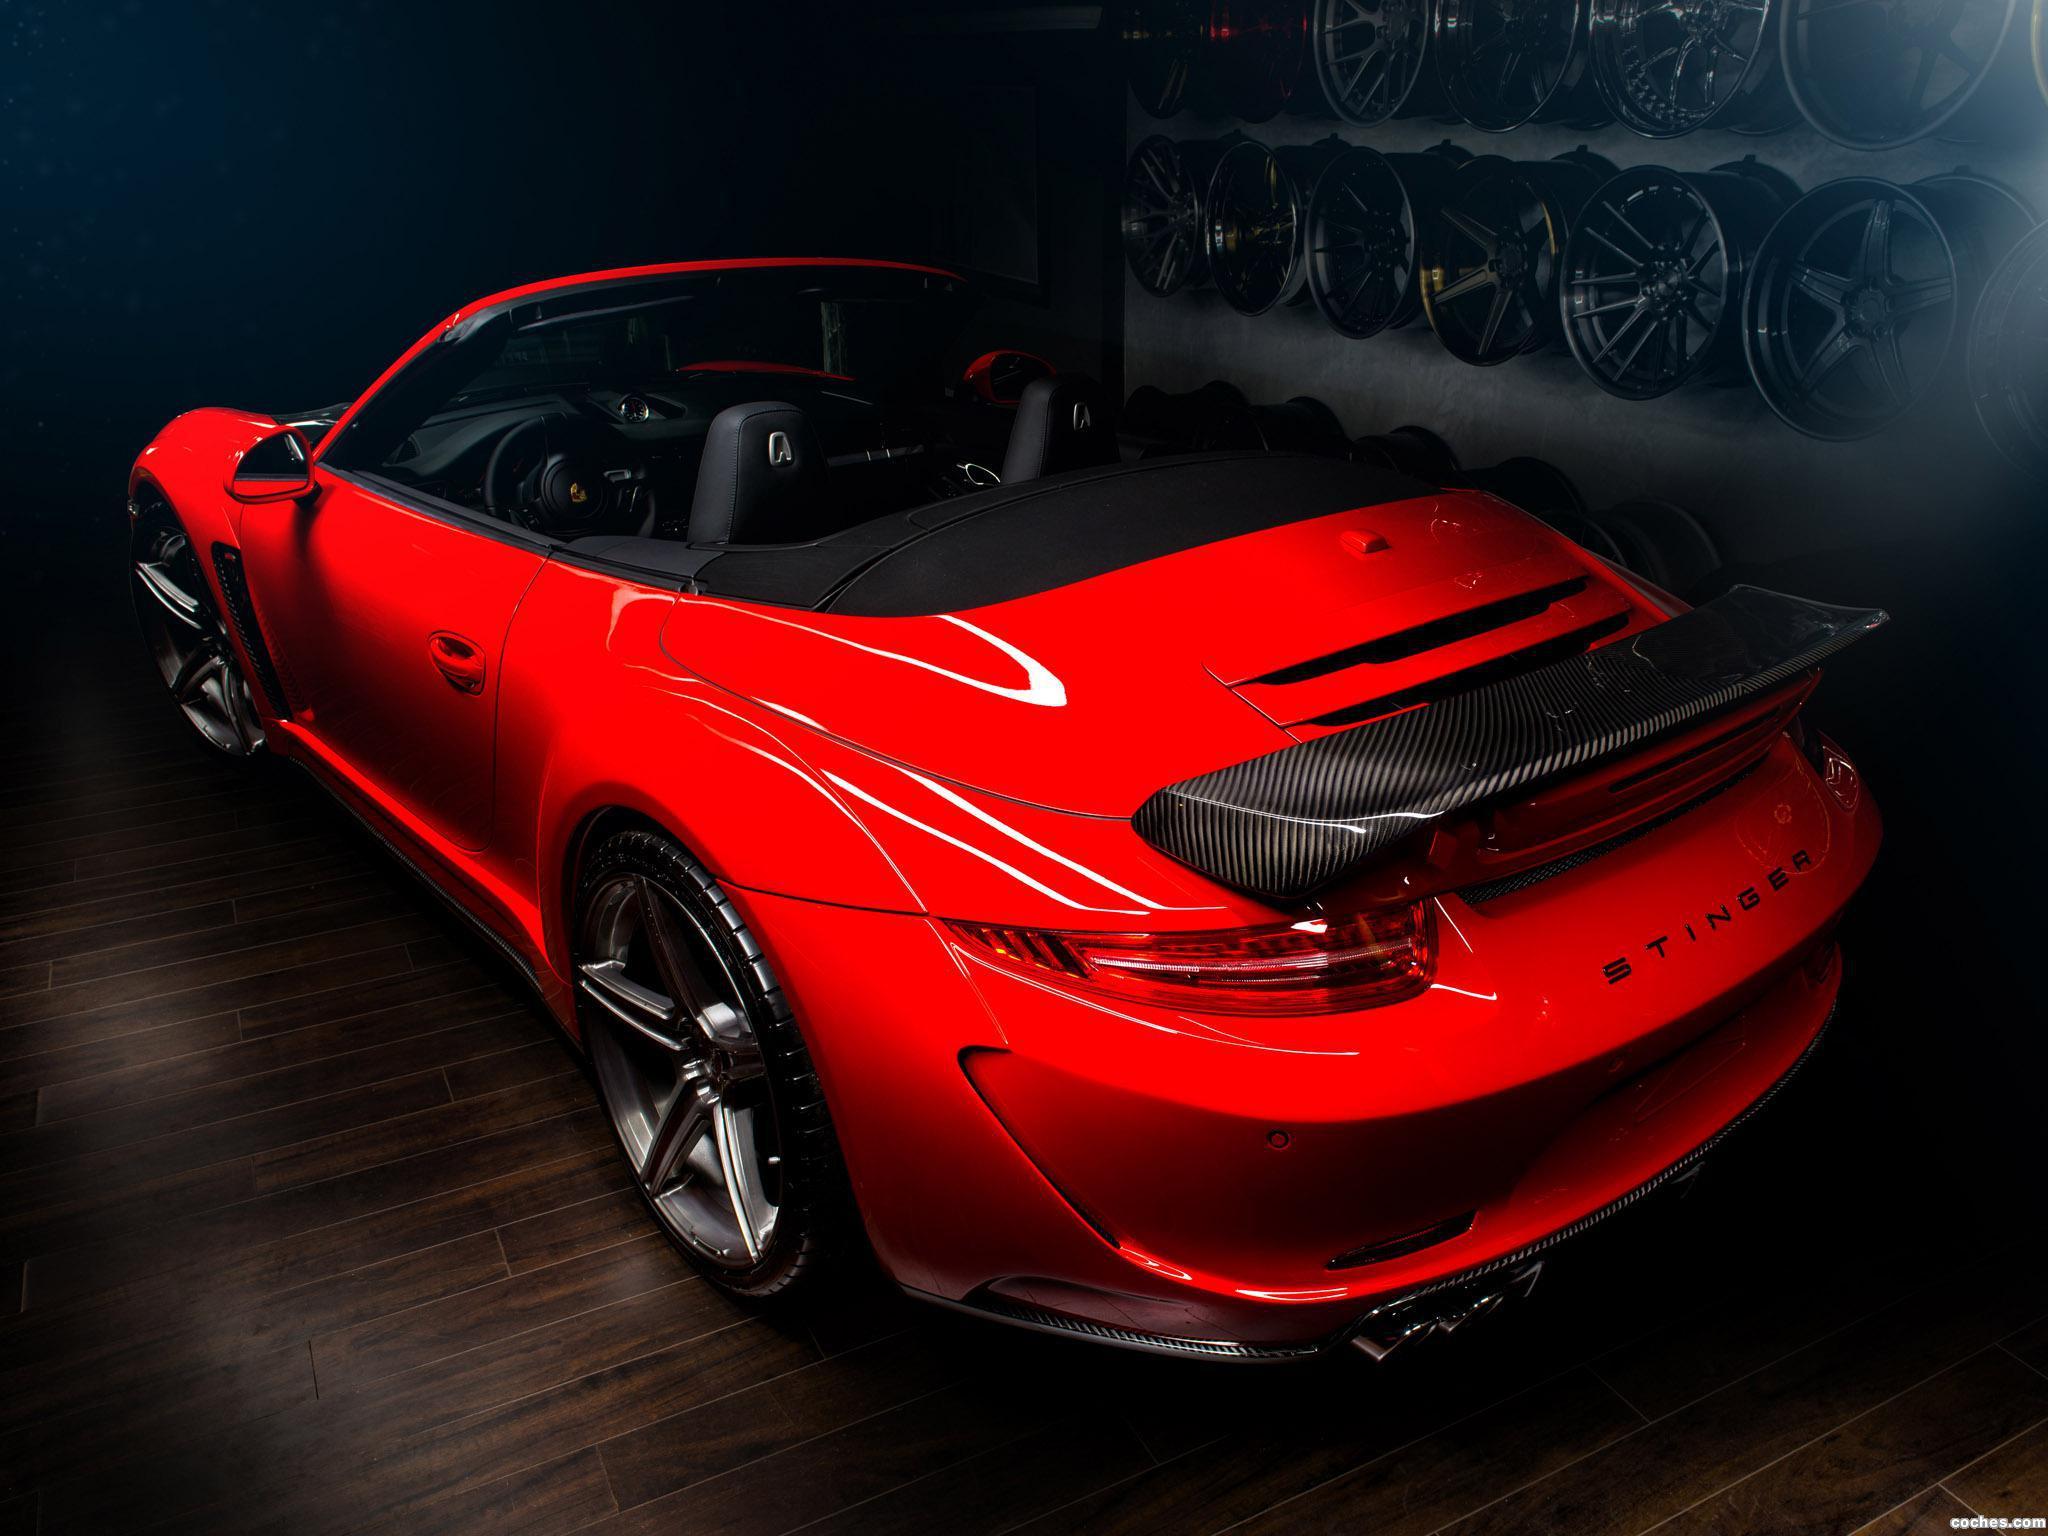 Foto 1 de Porsche Topcar 911 Carrera Stinger Cabriolet 991 2014